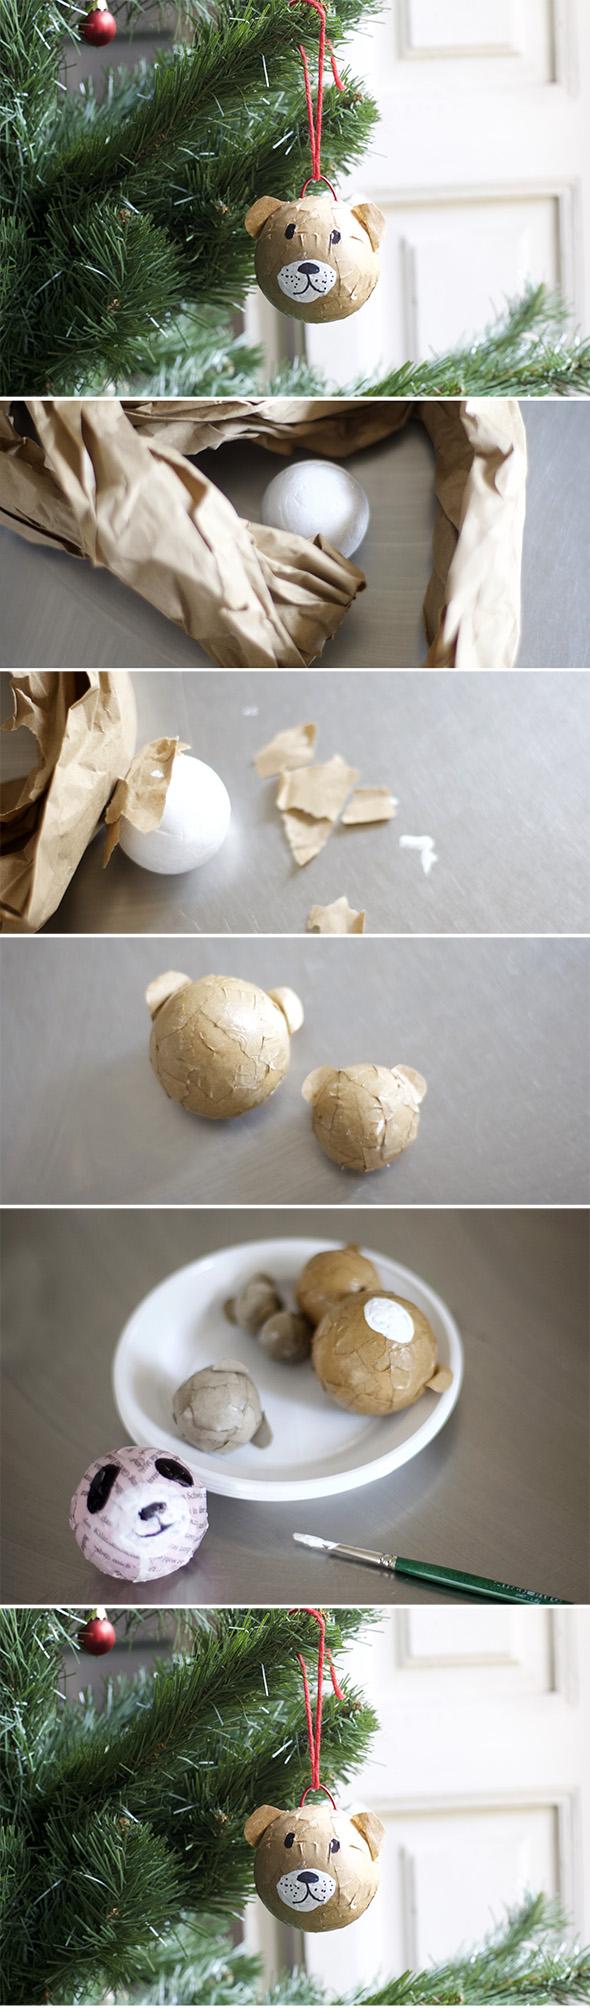 weihnachtskugel craft basteln manualidad easy einfach simple bolas de Navidad Christmas balls